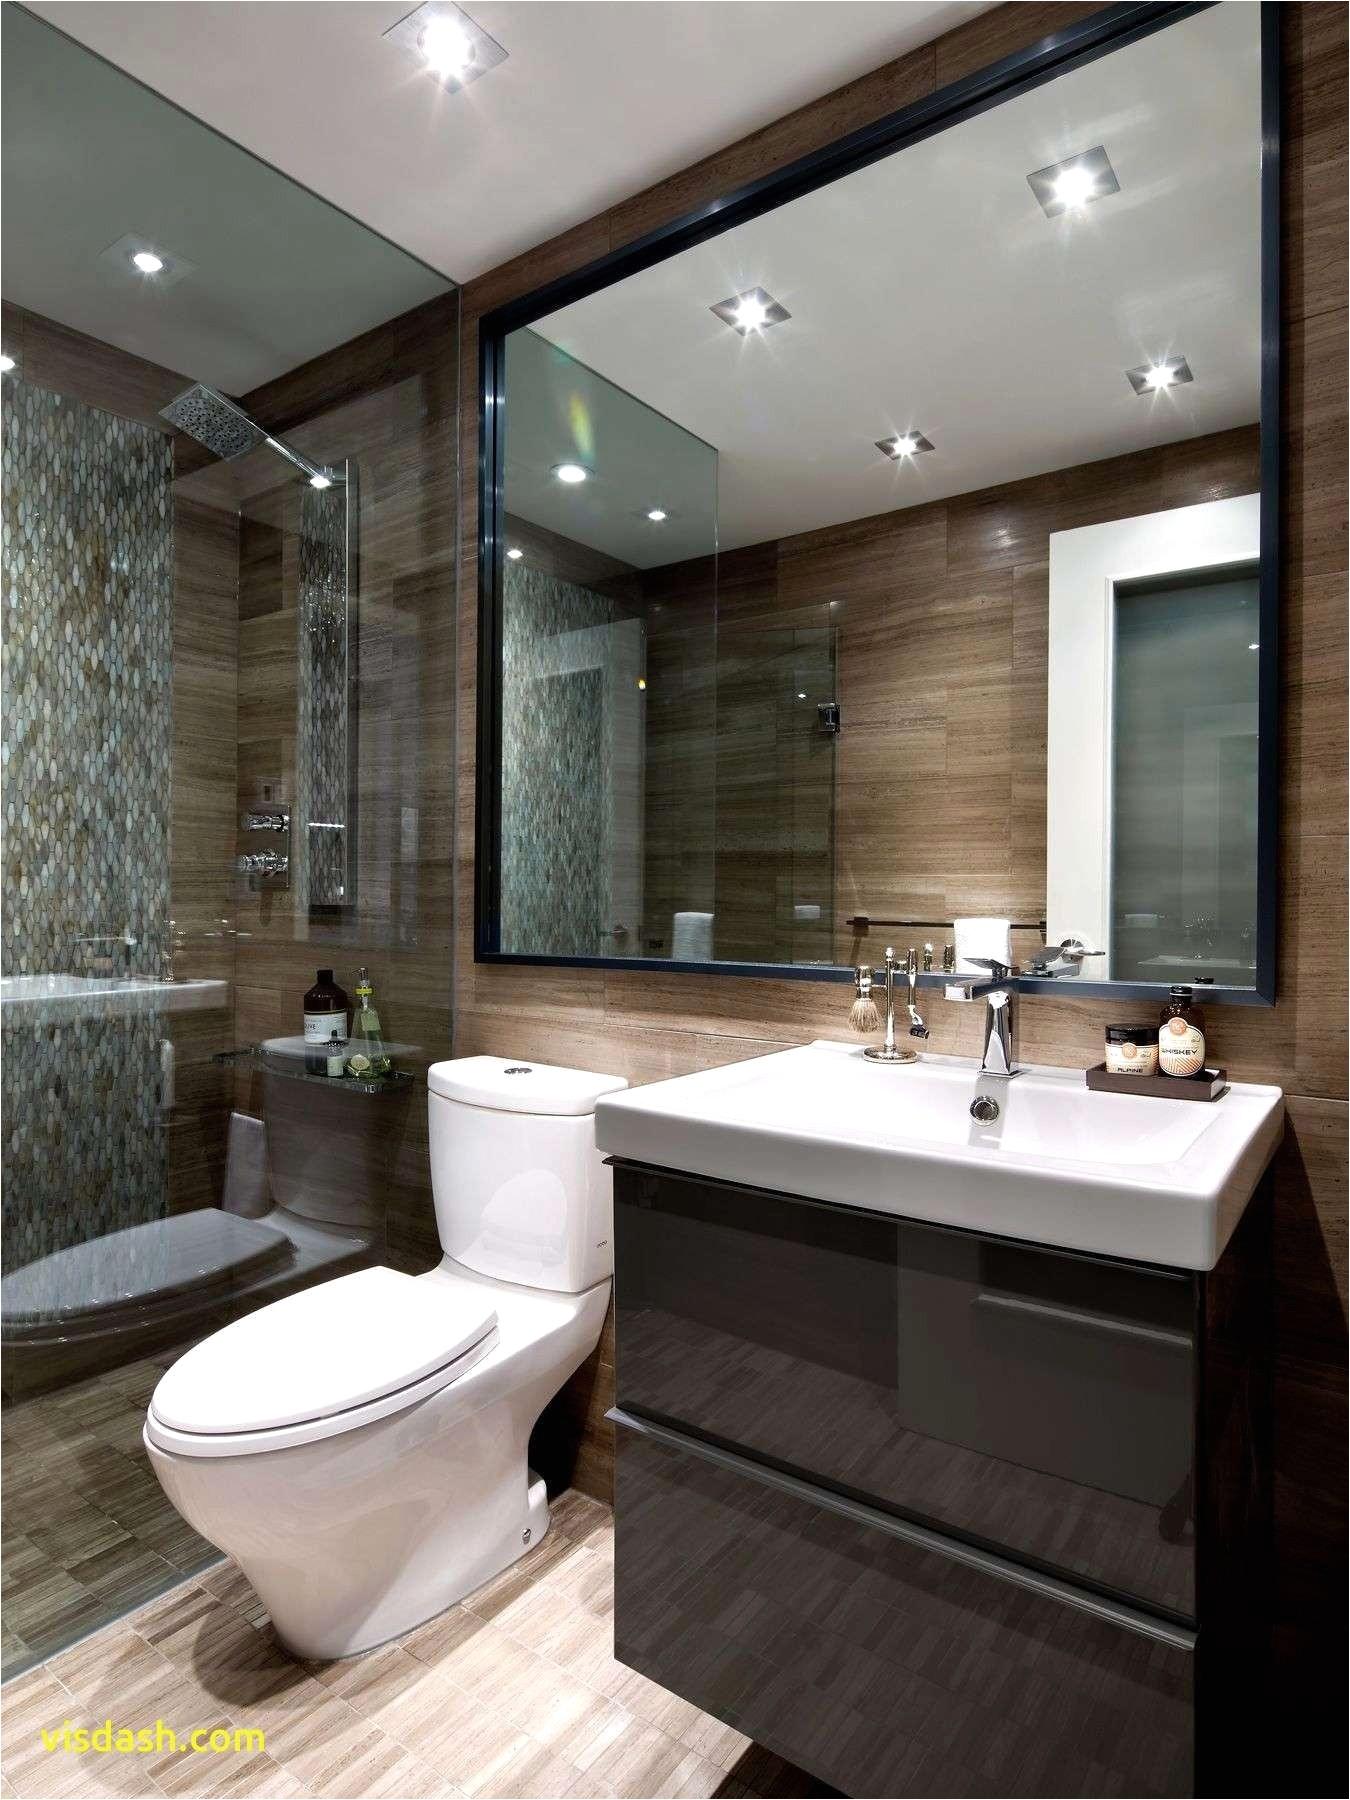 4 Piece Bathroom Rug Set Luxury Rugs Palem Project Idea